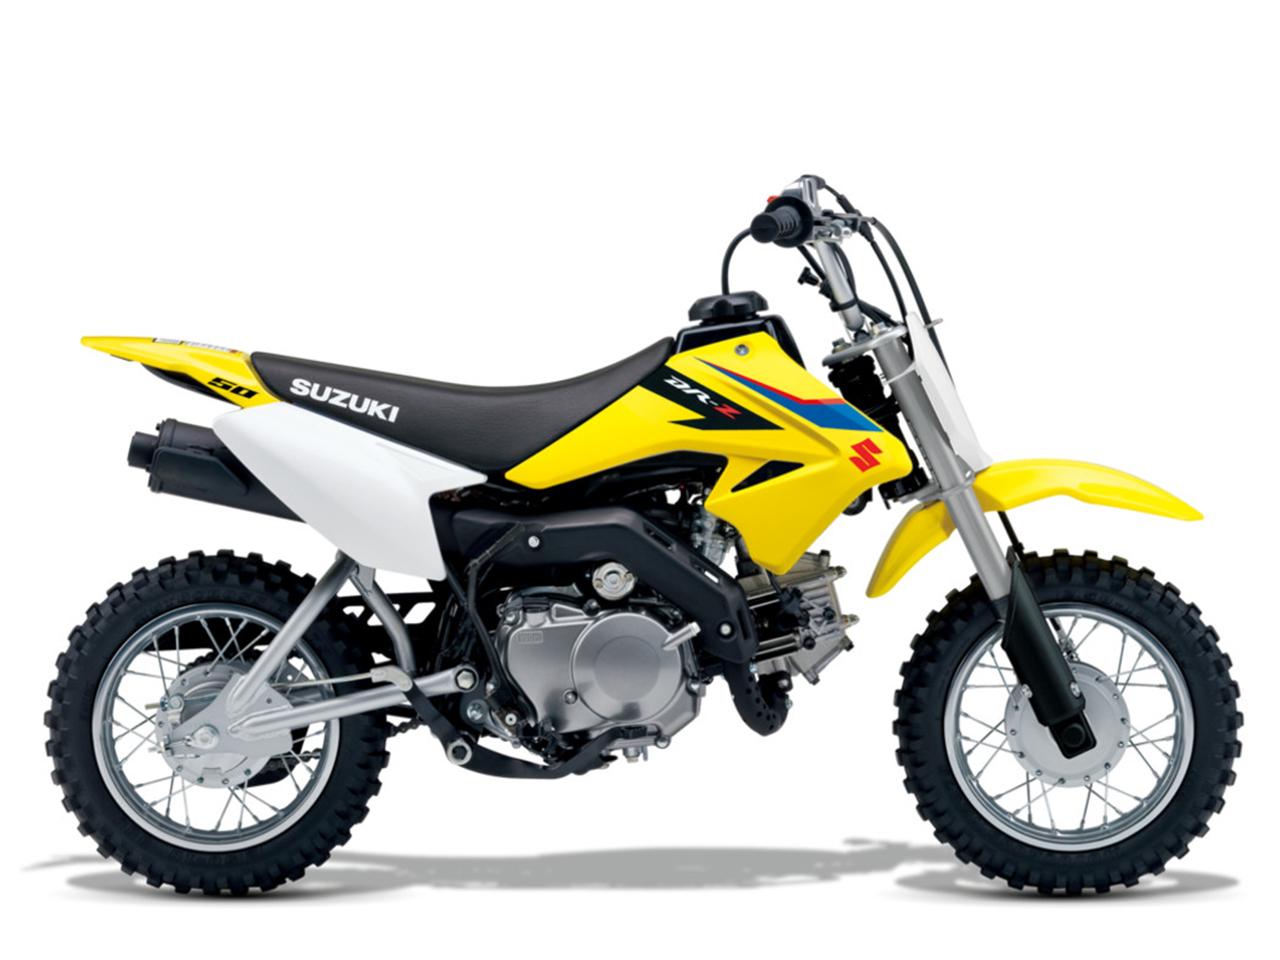 Suzuki Dr Z50 2019 Champion Yellow ⋆ Motorcycles R Us